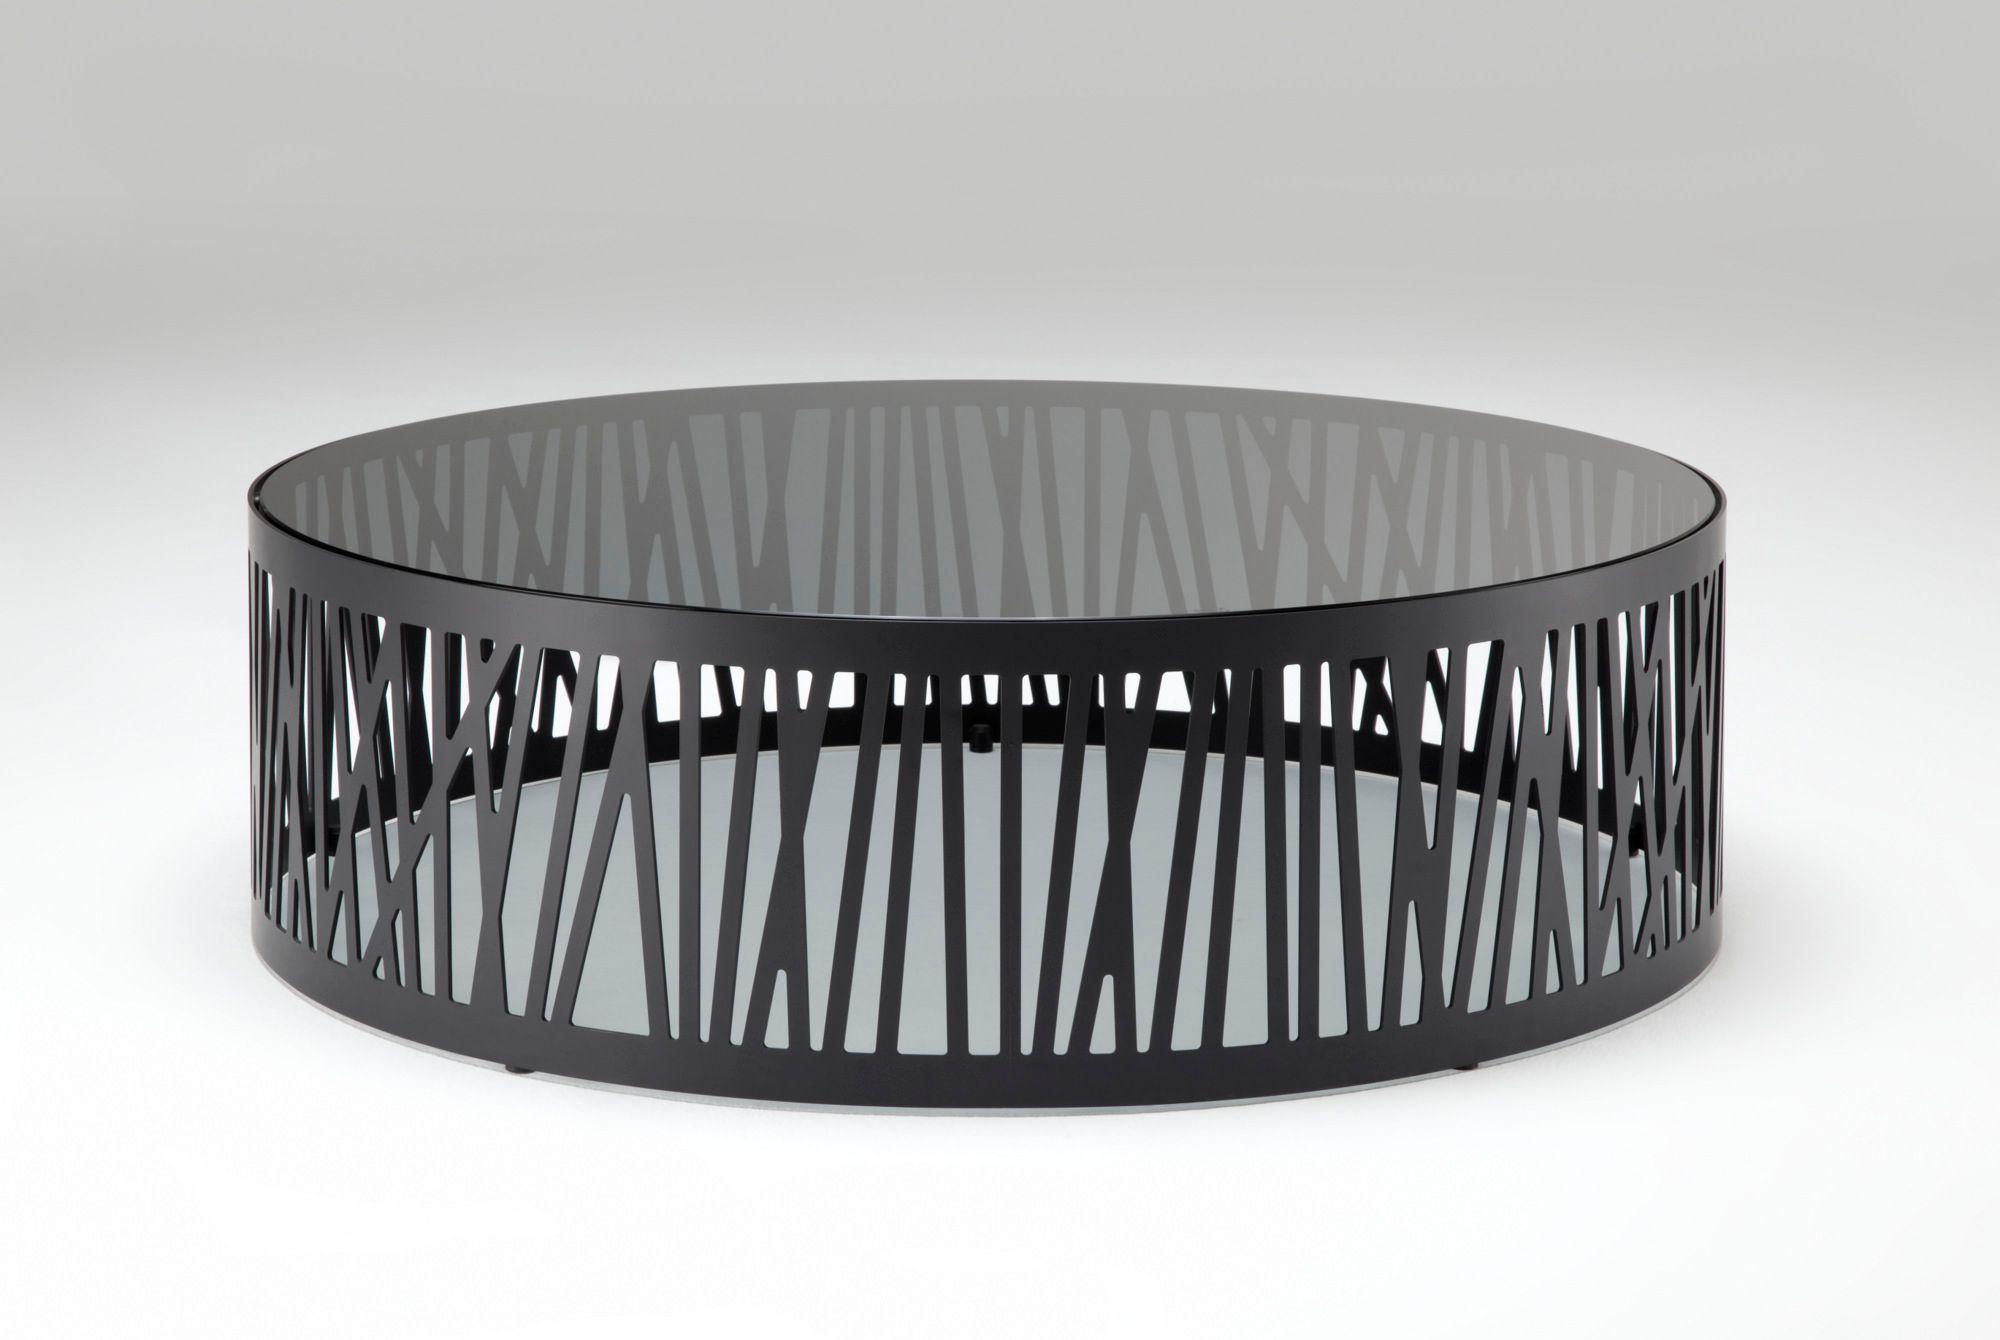 Round glass and steel coffee table ORION By Bonaldo design Jarrod Lim